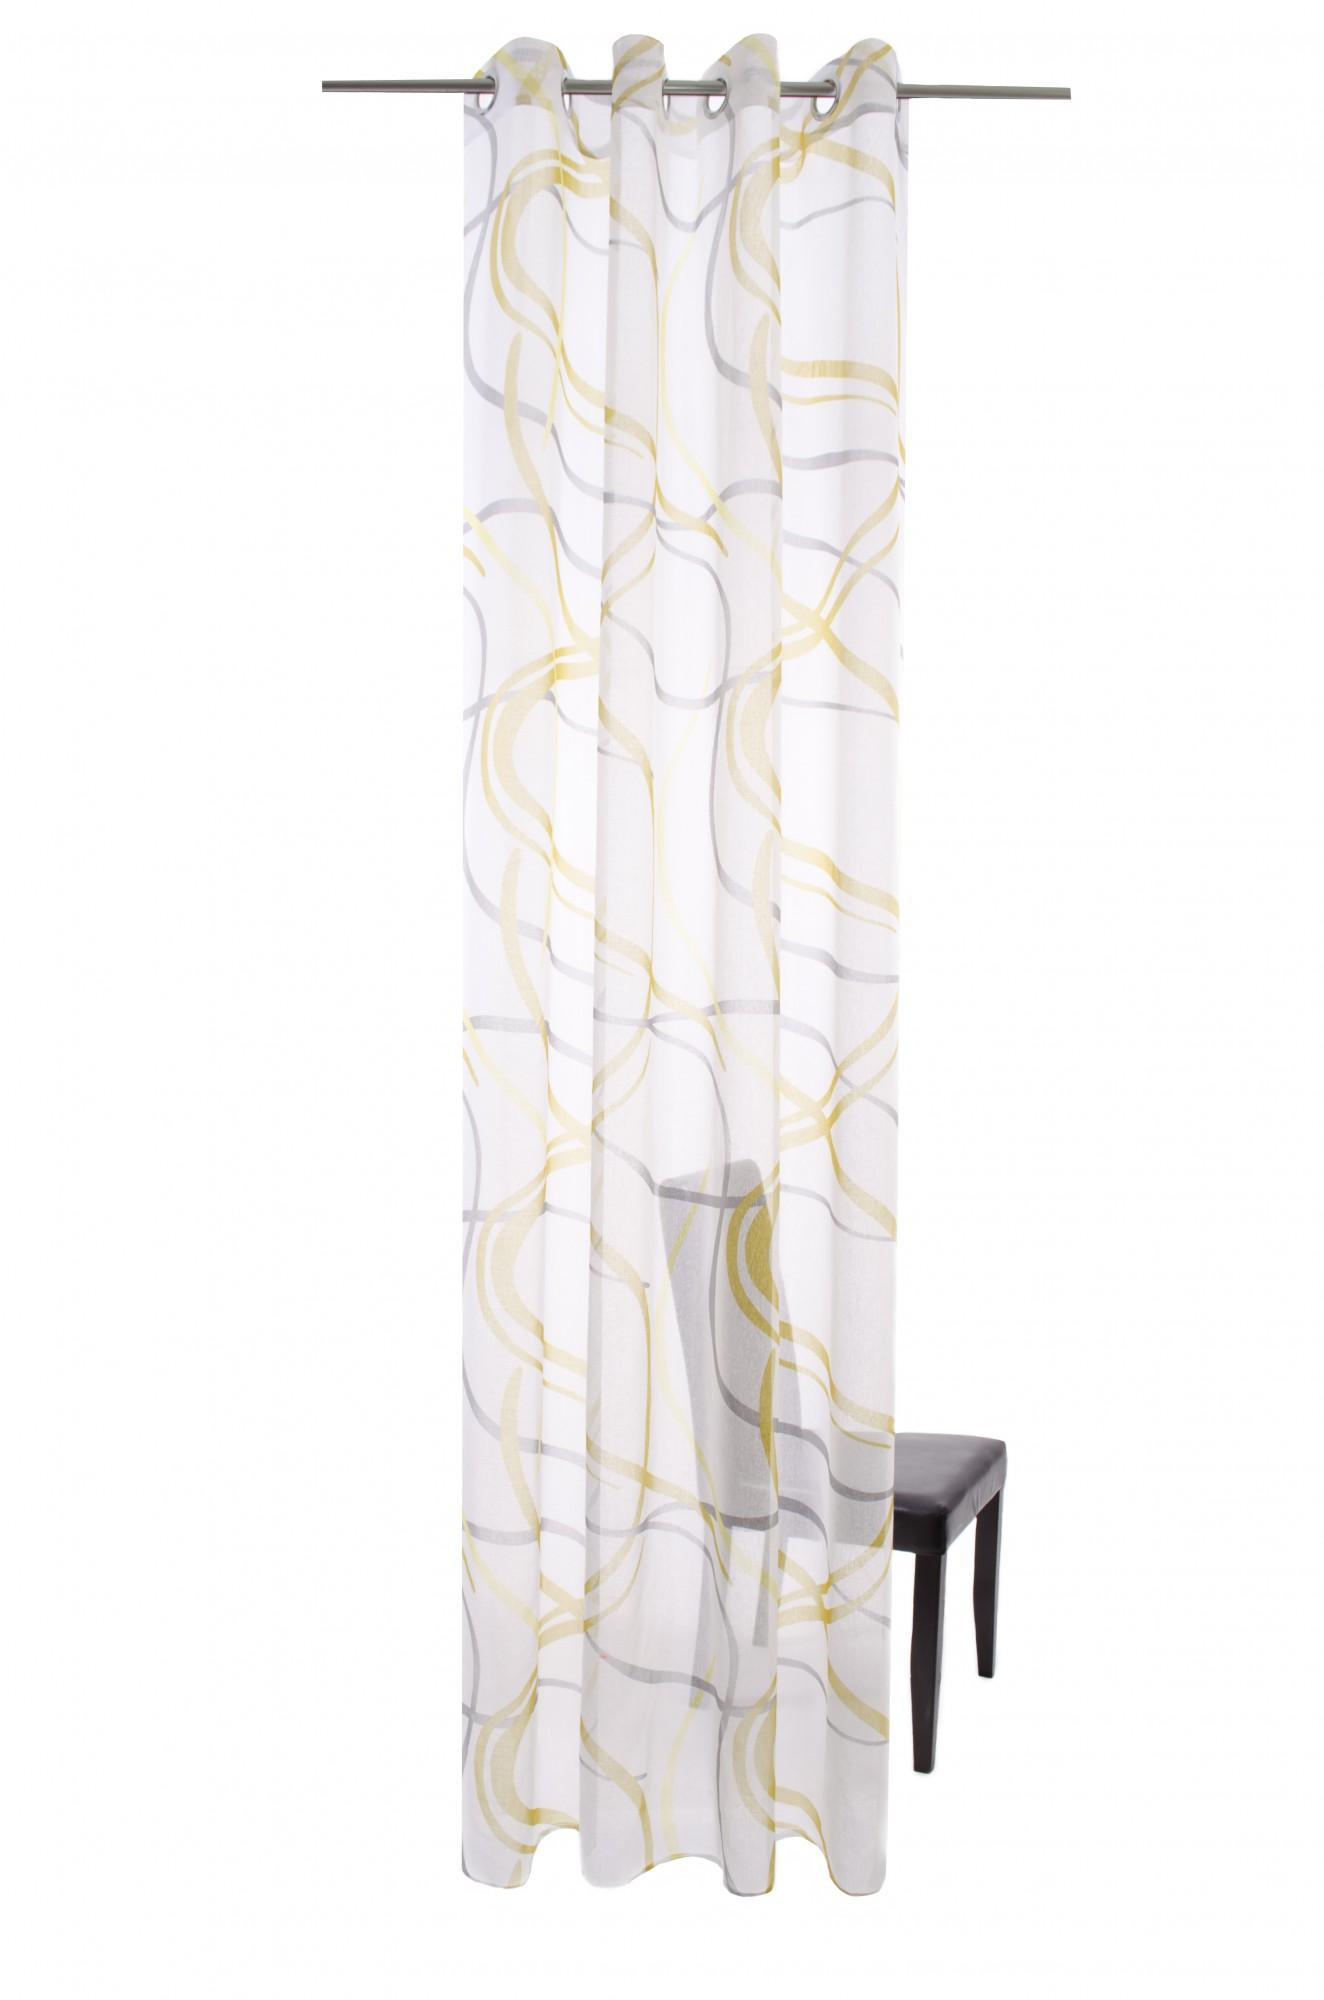 senschal halbtransparent wei gr n gestreift 5795 01. Black Bedroom Furniture Sets. Home Design Ideas